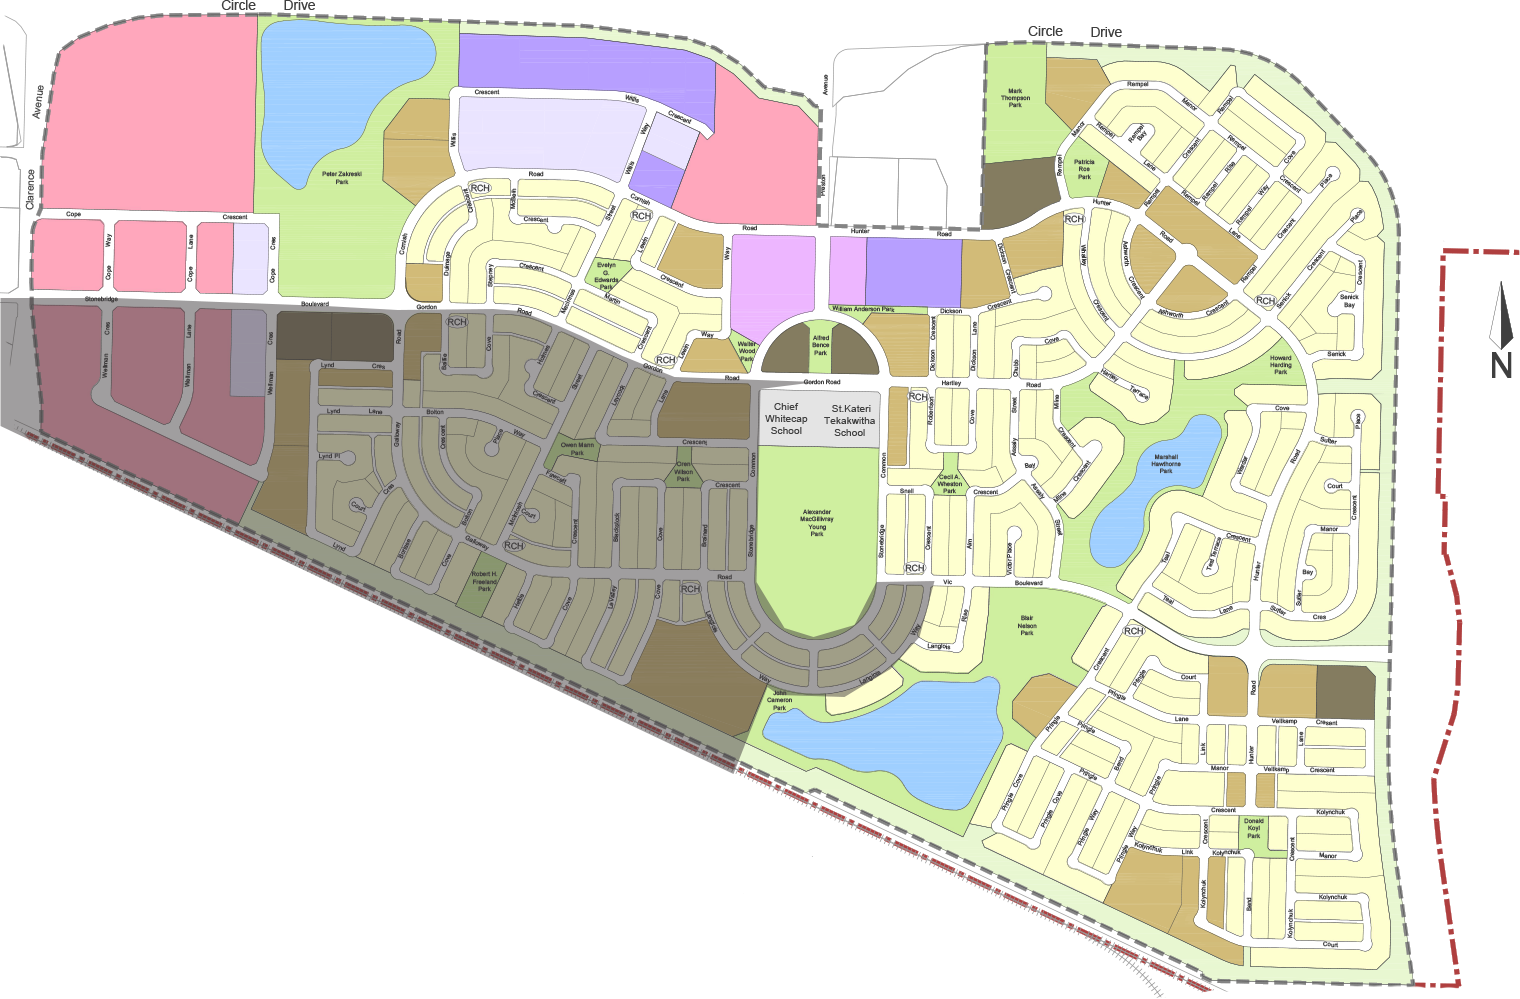 Southwest - South of Stonebridge Boulevard and Gordon Road, West of Langois Way and Alexander MacGillivary park